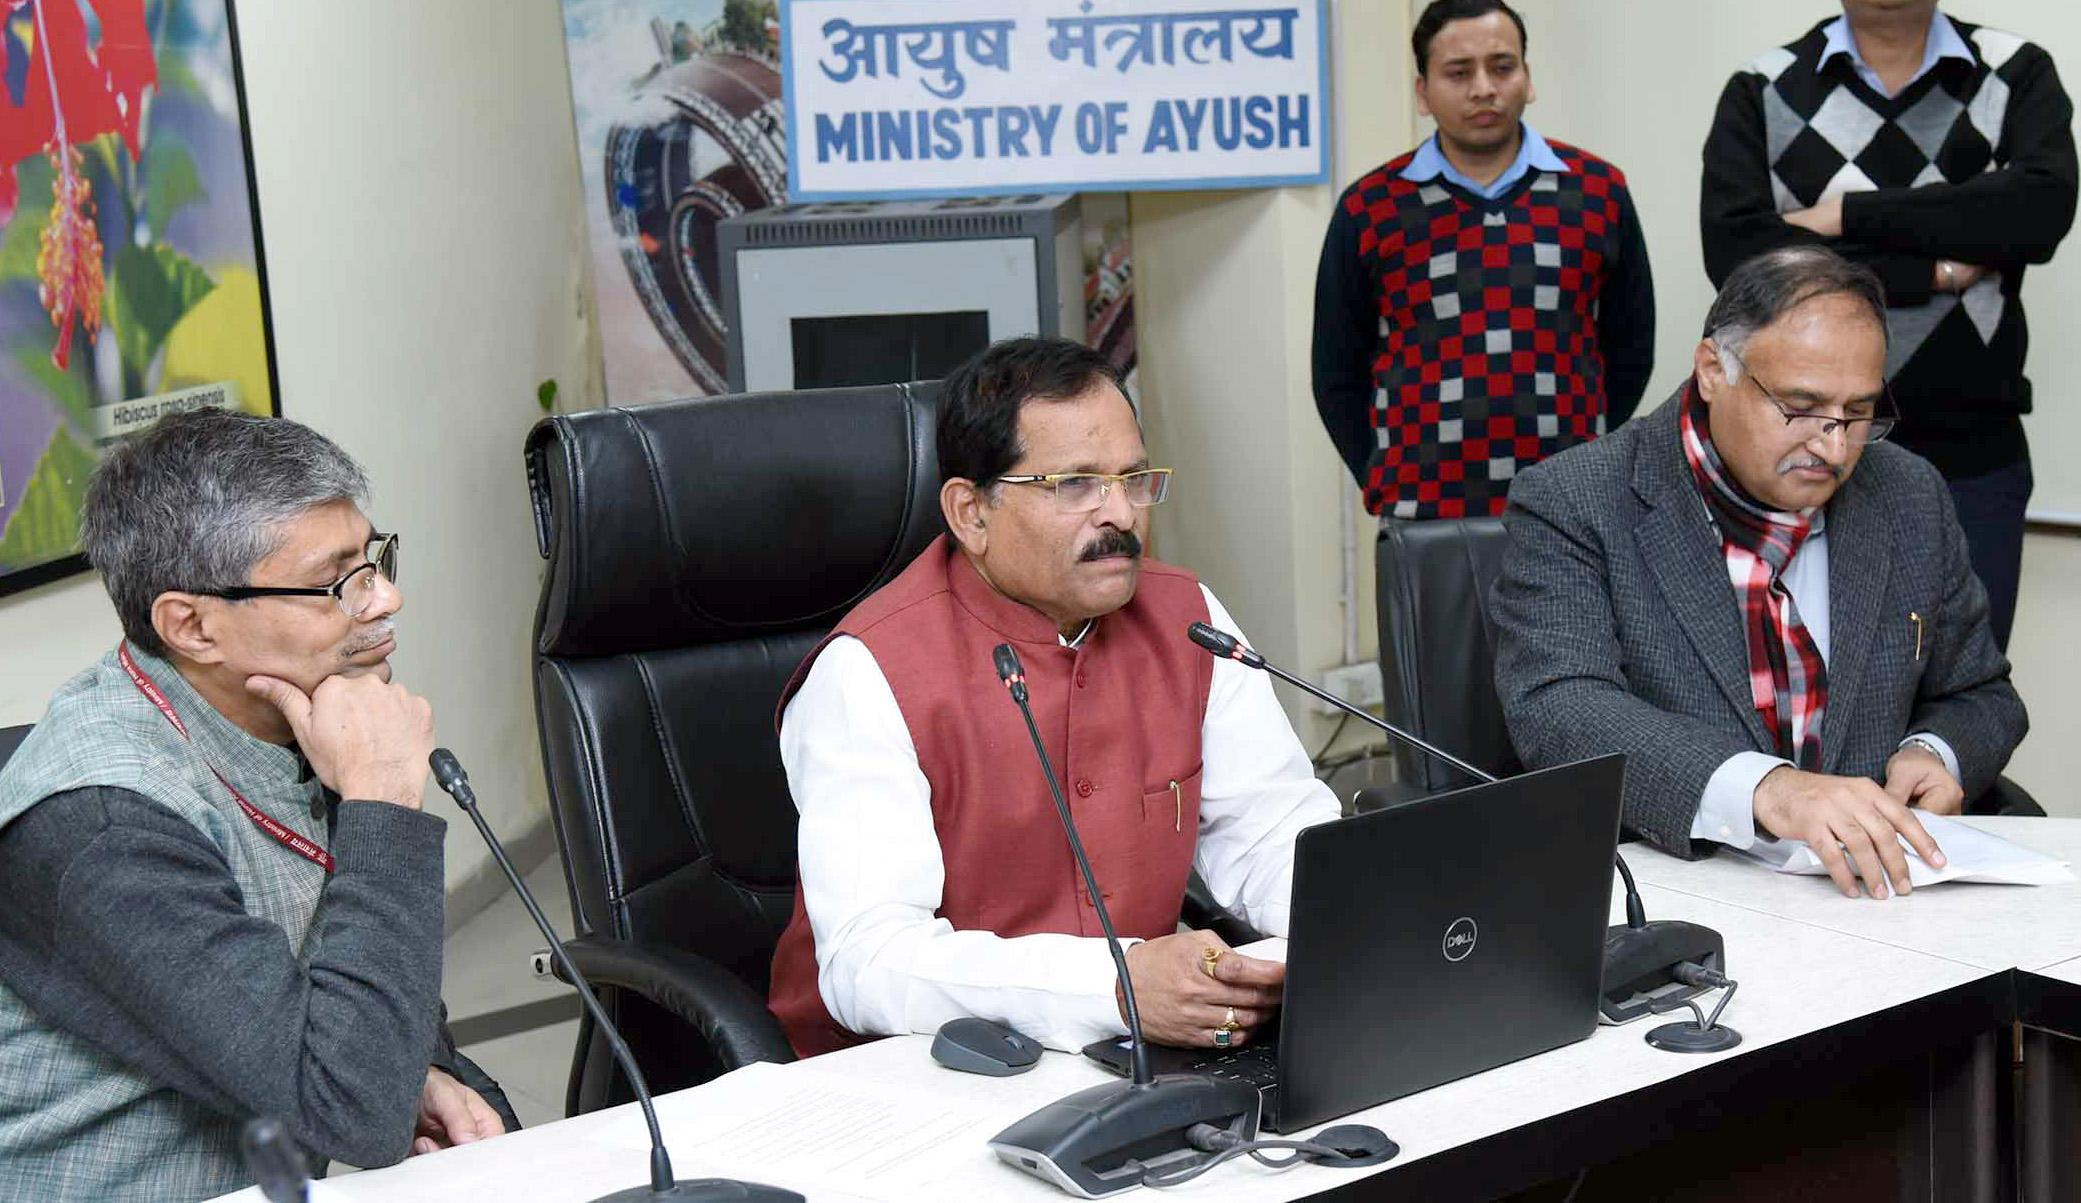 Launch of E-Drug portal for online license system of AYUSH drugs